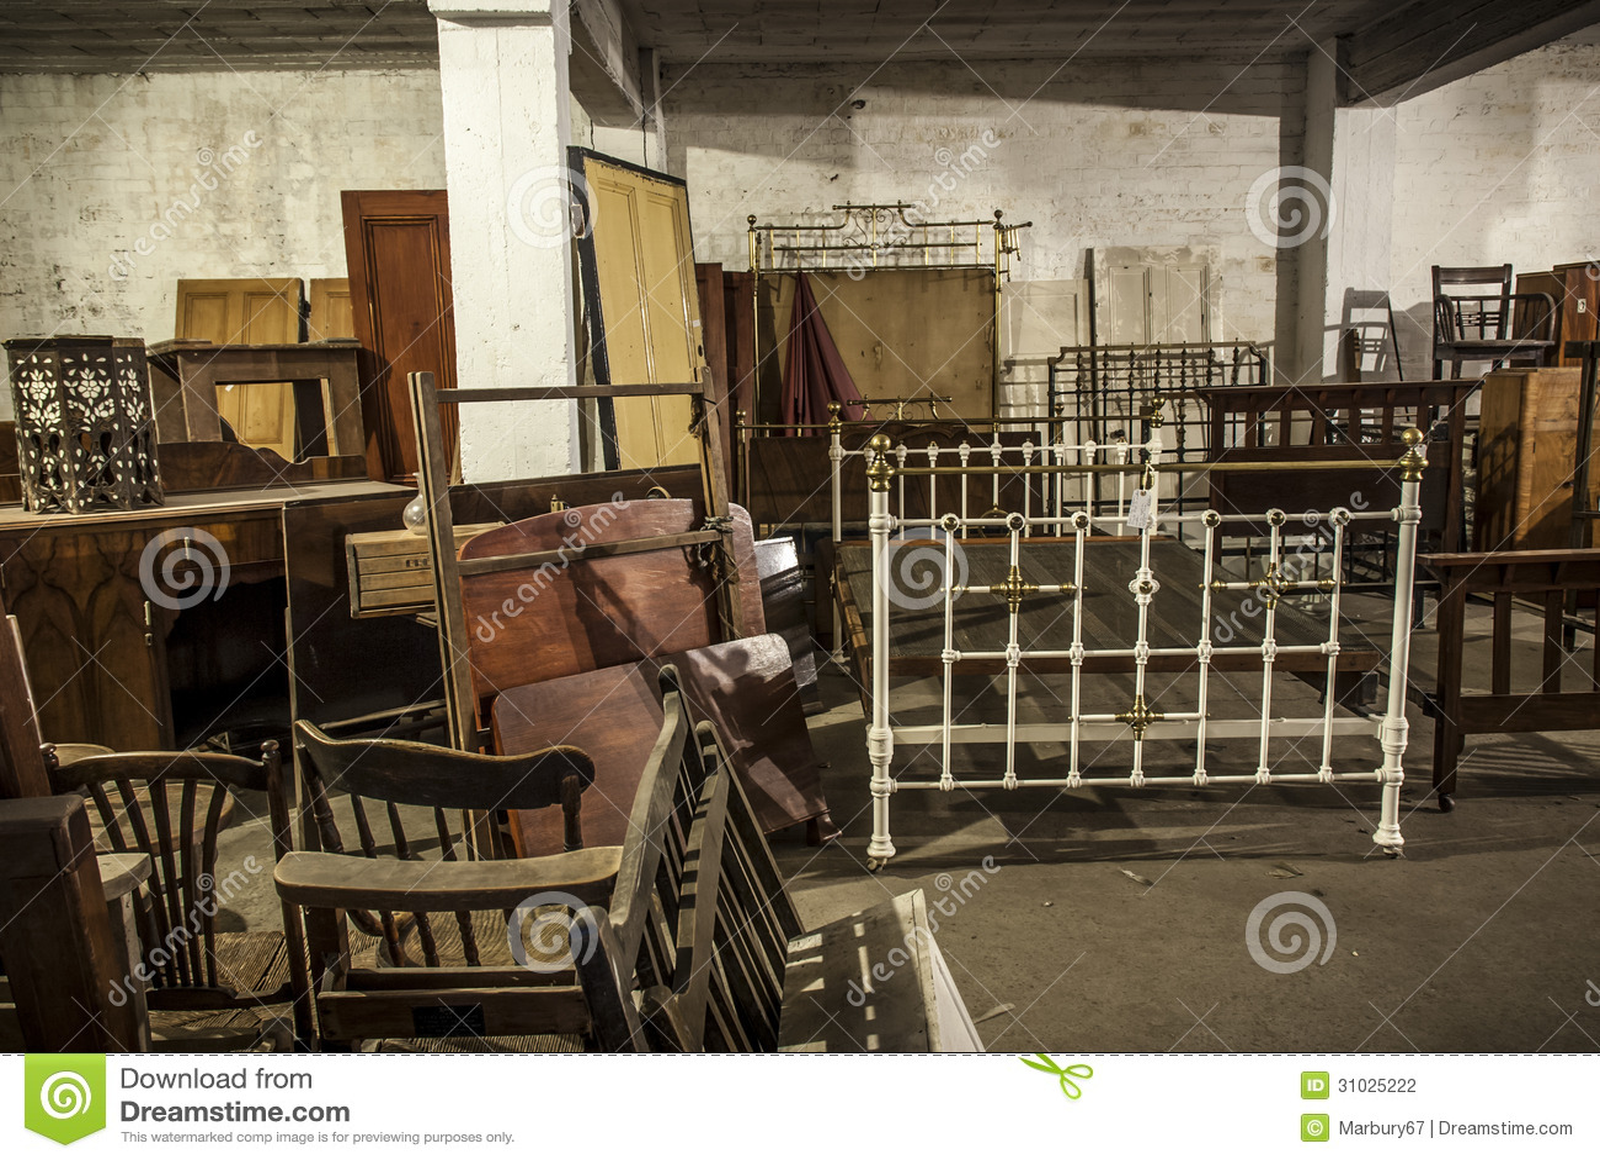 Max Furniture Warehouse